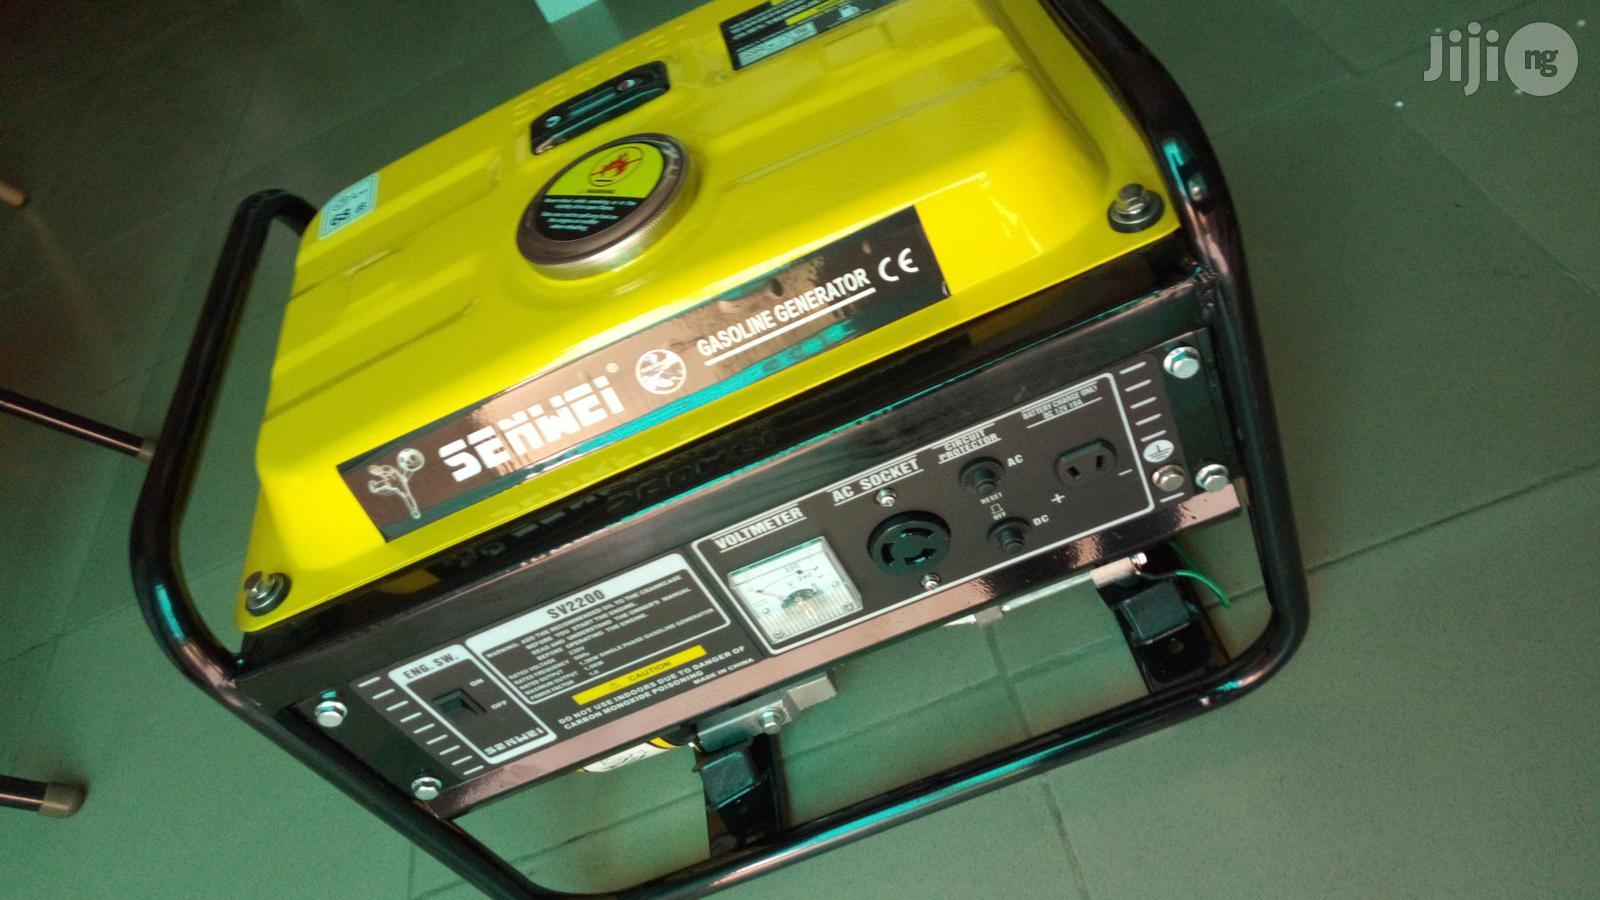 Senwei SV2200 Generator